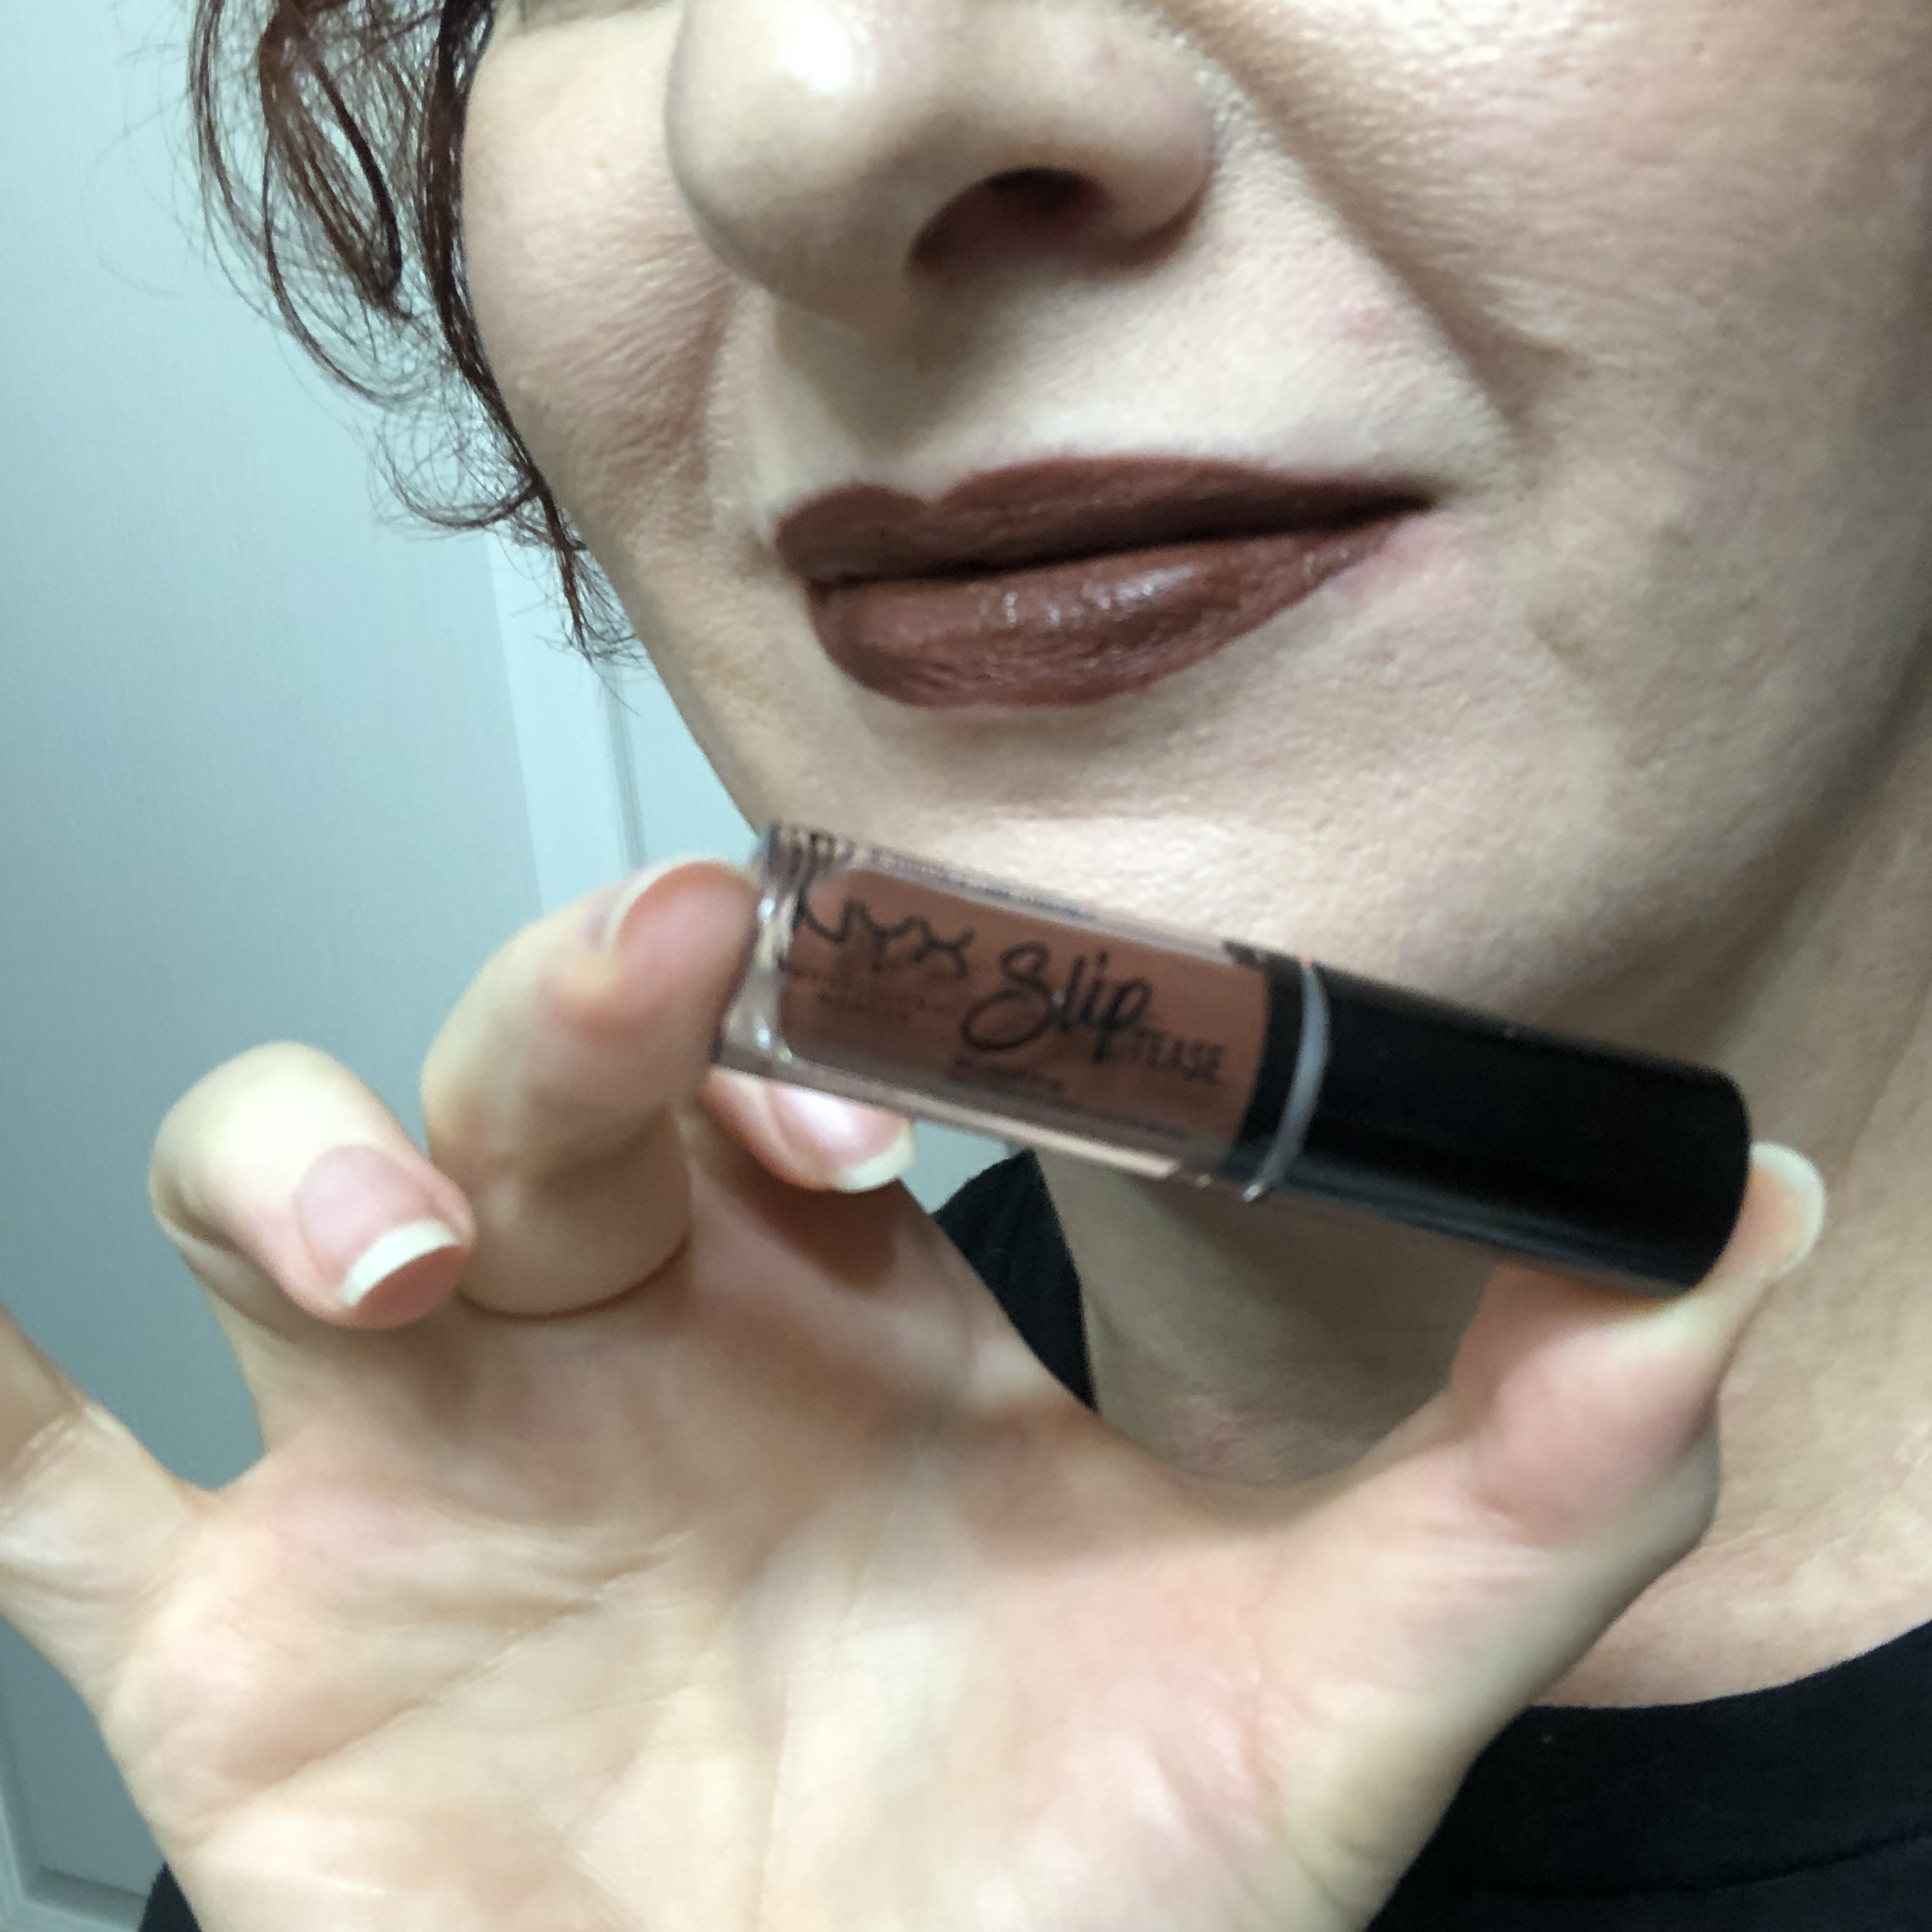 Nyx Sweet Chateau Slip Tease Lip Vault Mystery Flavor Swatch